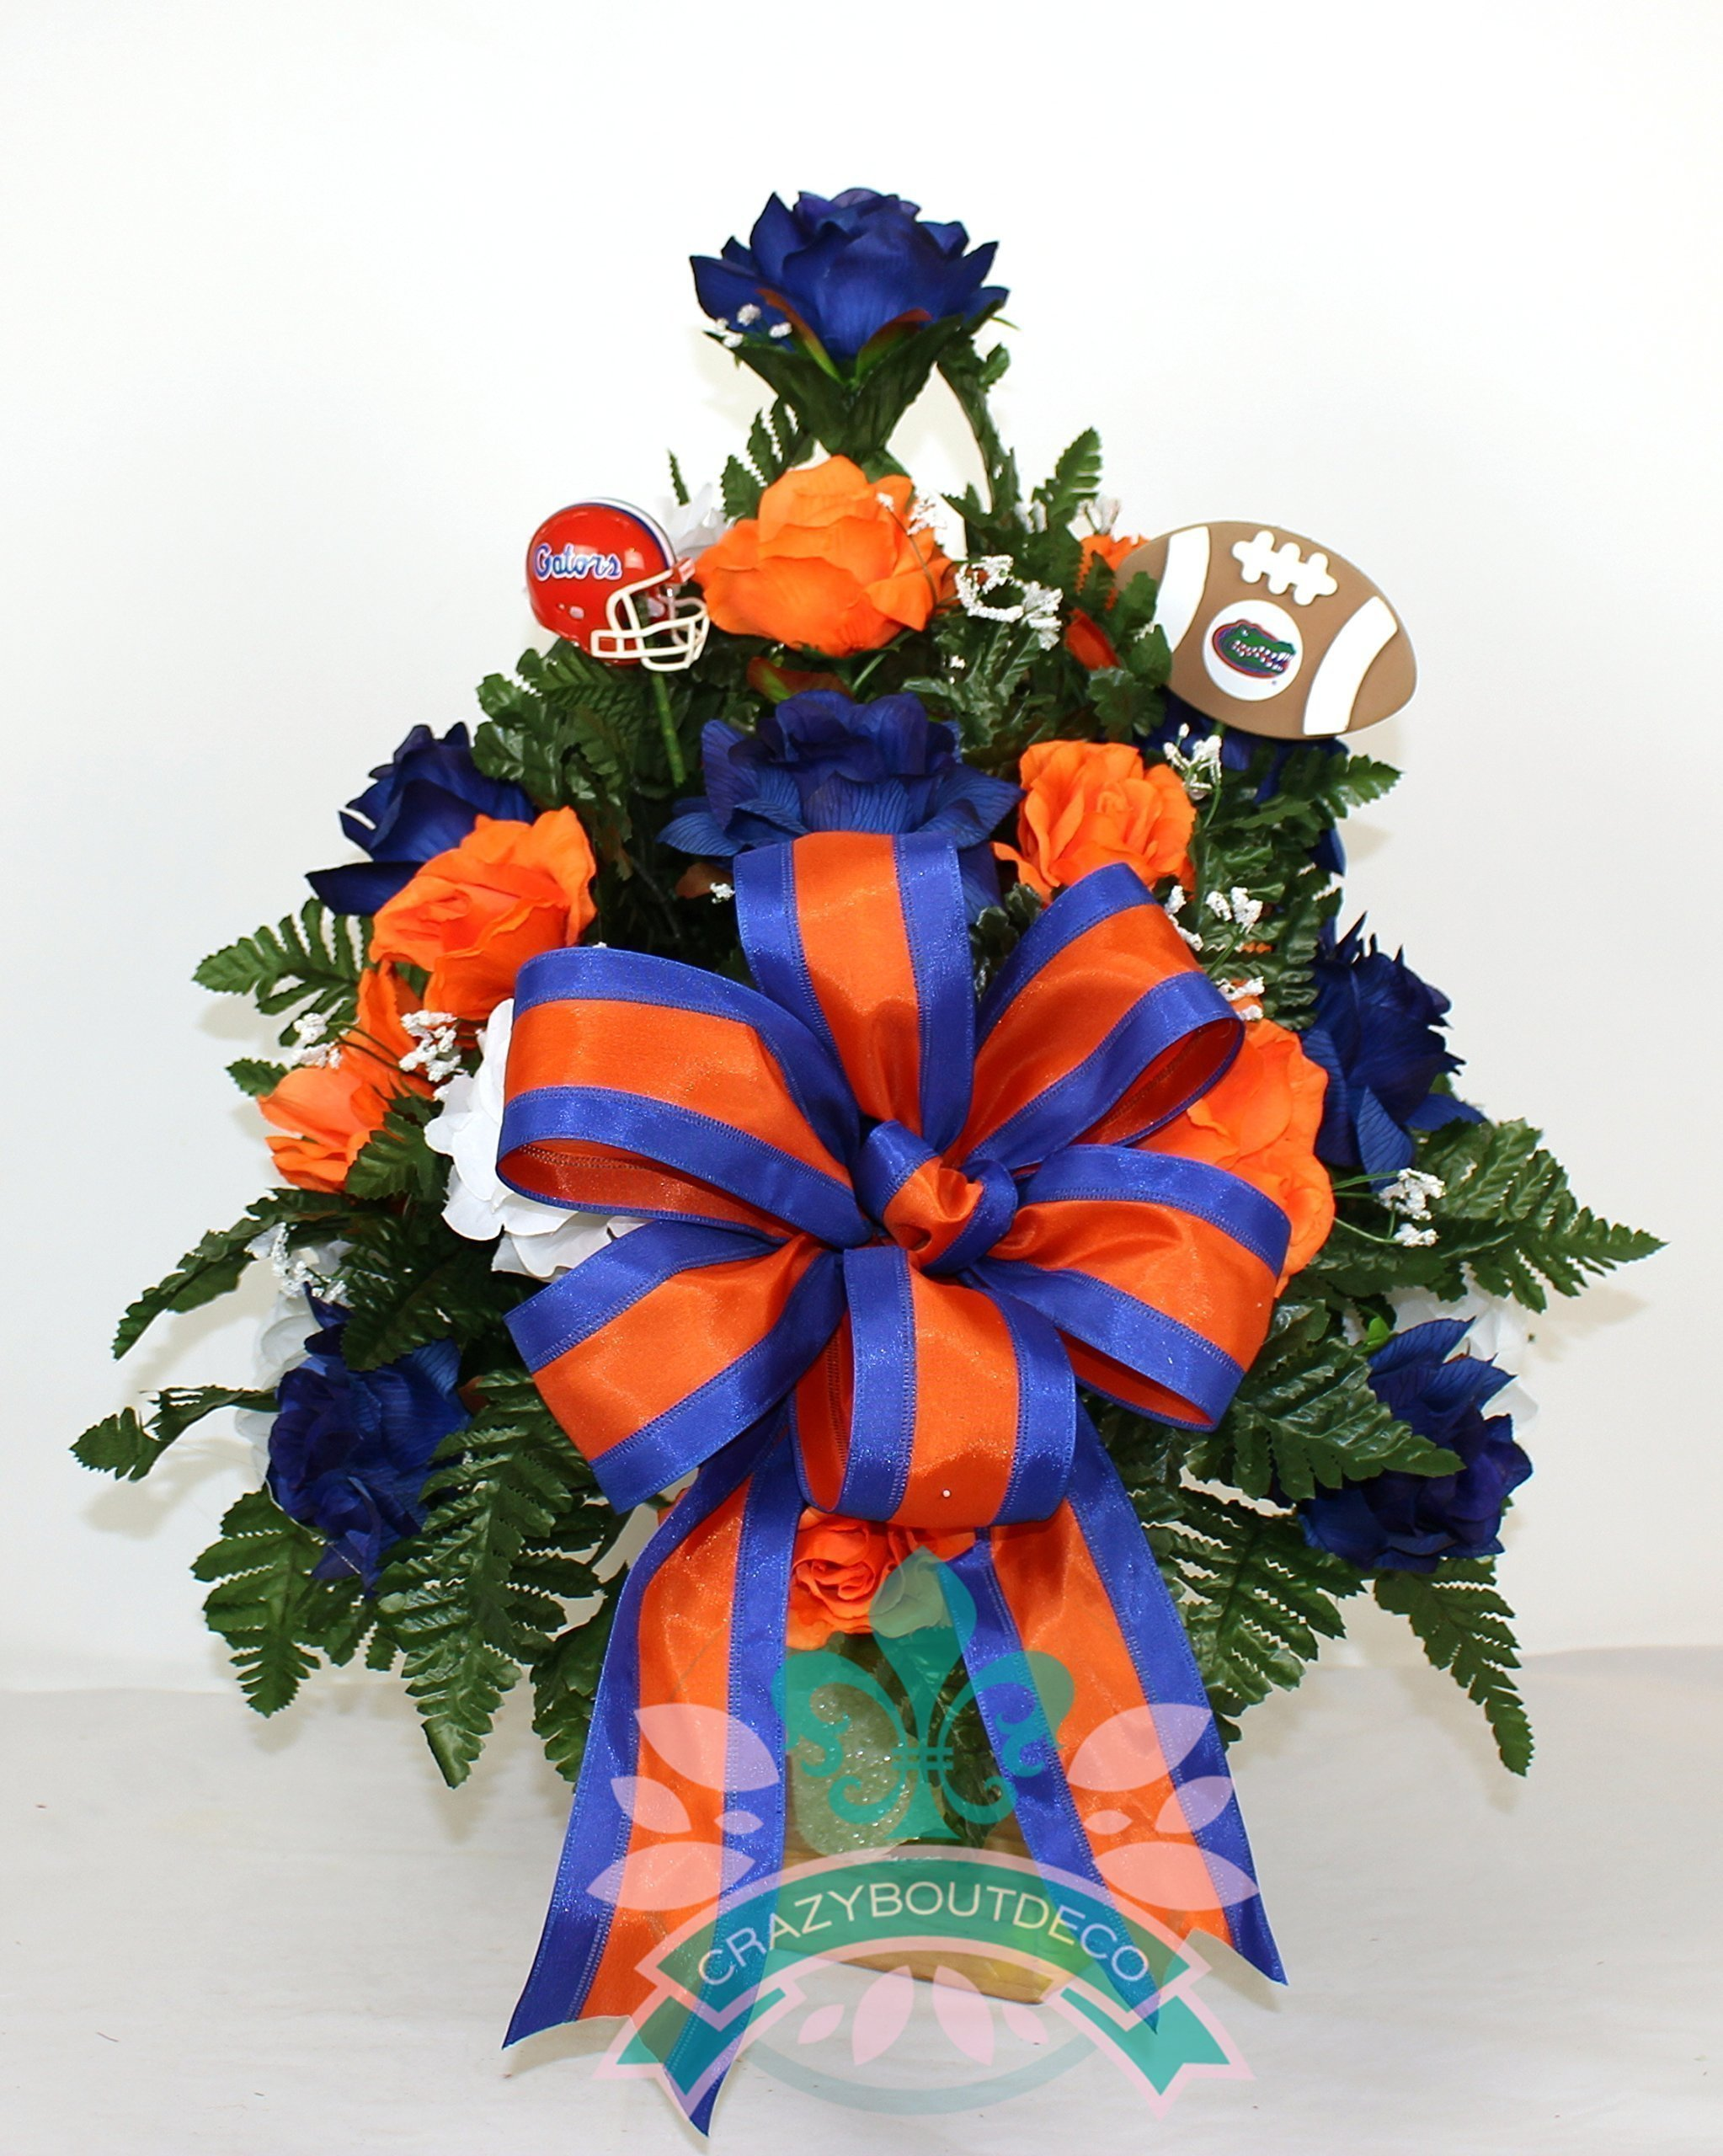 Florida Gators Fan Cemetery Vase Arrangement featuring Orange, White Roses by Crazyboutdeco Deco Mesh Wreaths,Cemetery Arrangements (Image #1)